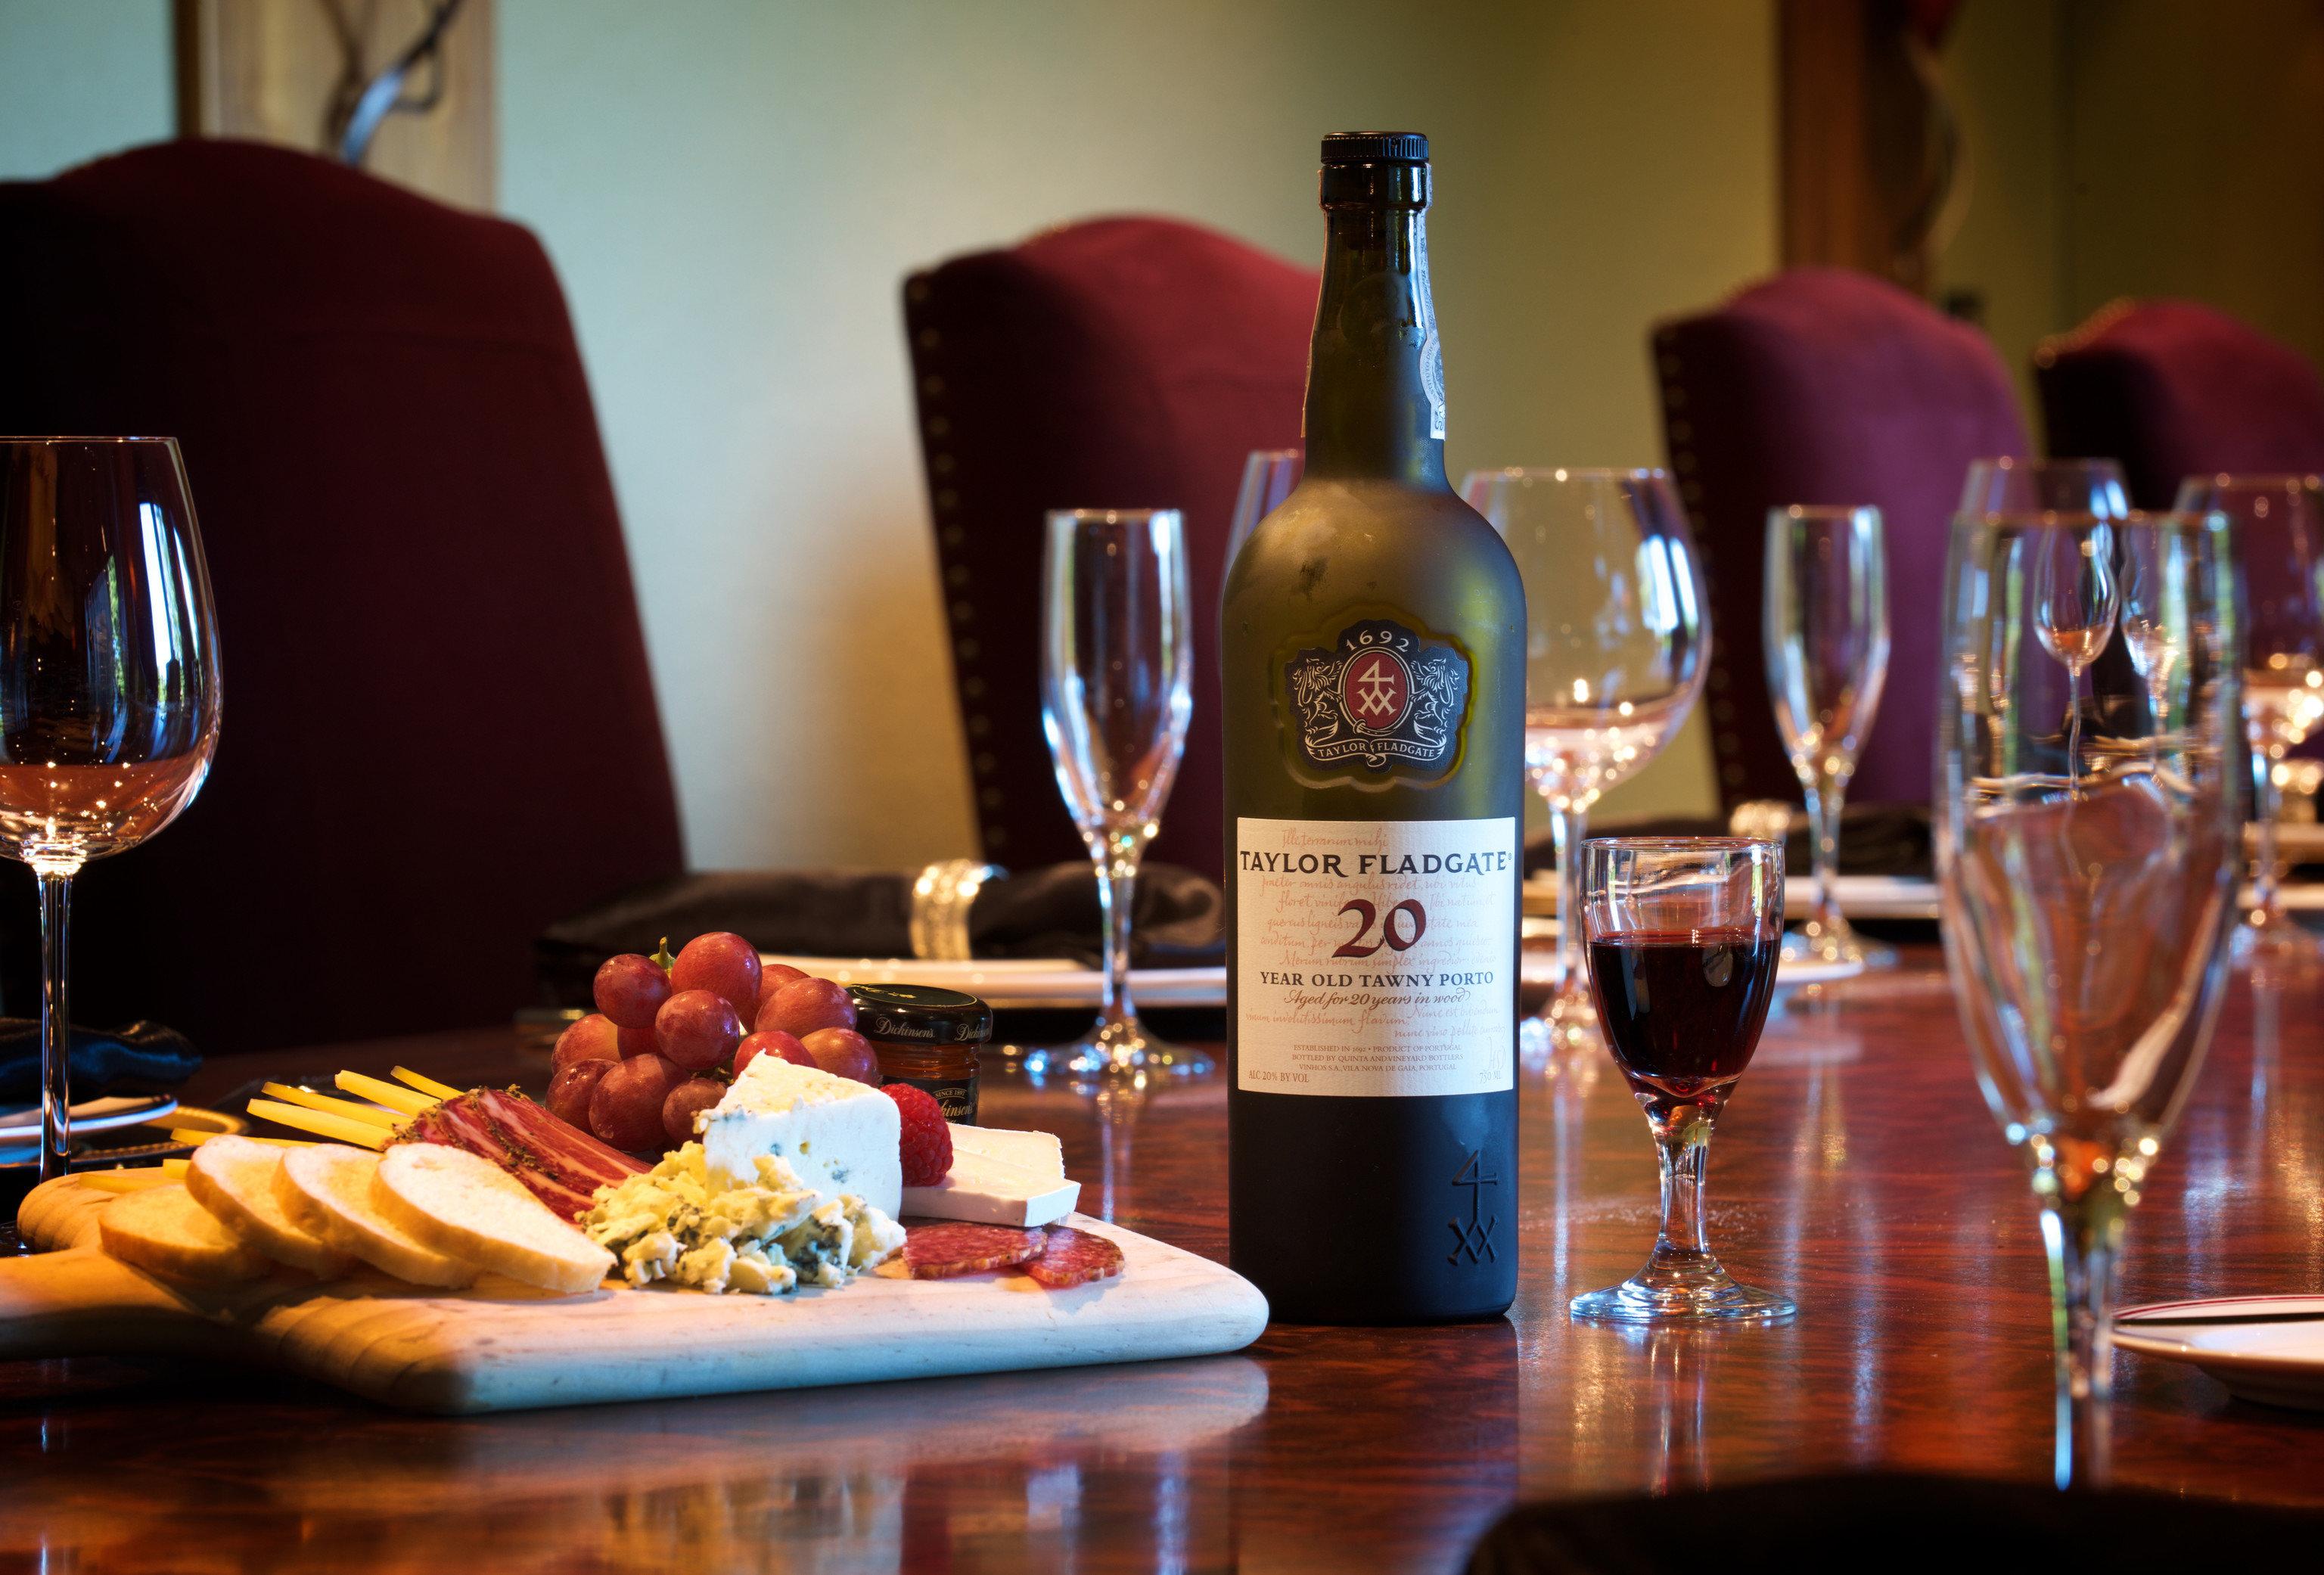 wine alcoholic beverage Drink restaurant dinner sense Bar